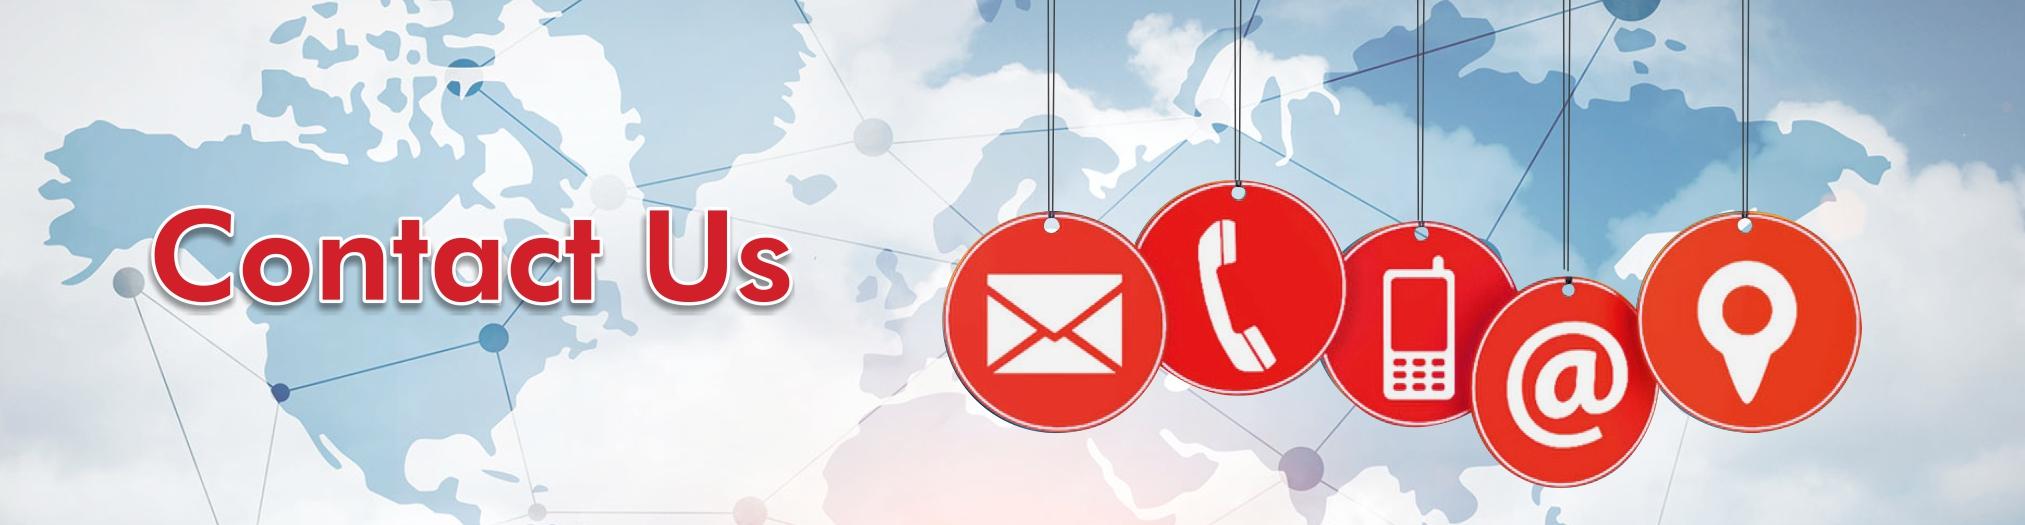 3fd86-webbanner-contact-us-1350x350px-2.jpg